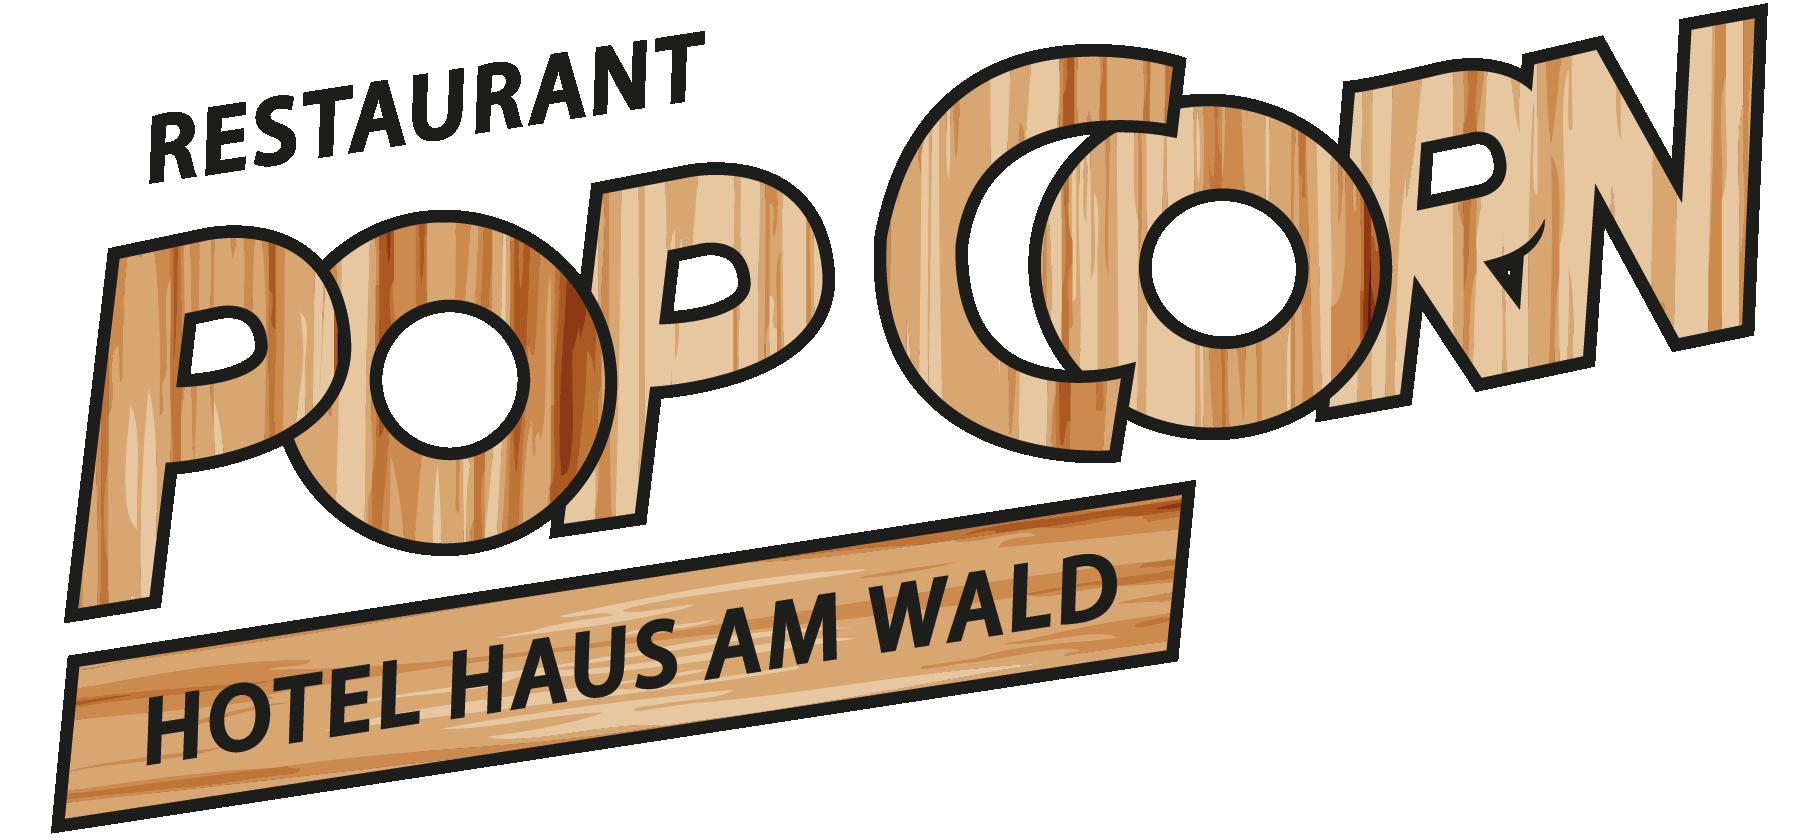 hotel haus am wald restaurant pop corn arosa